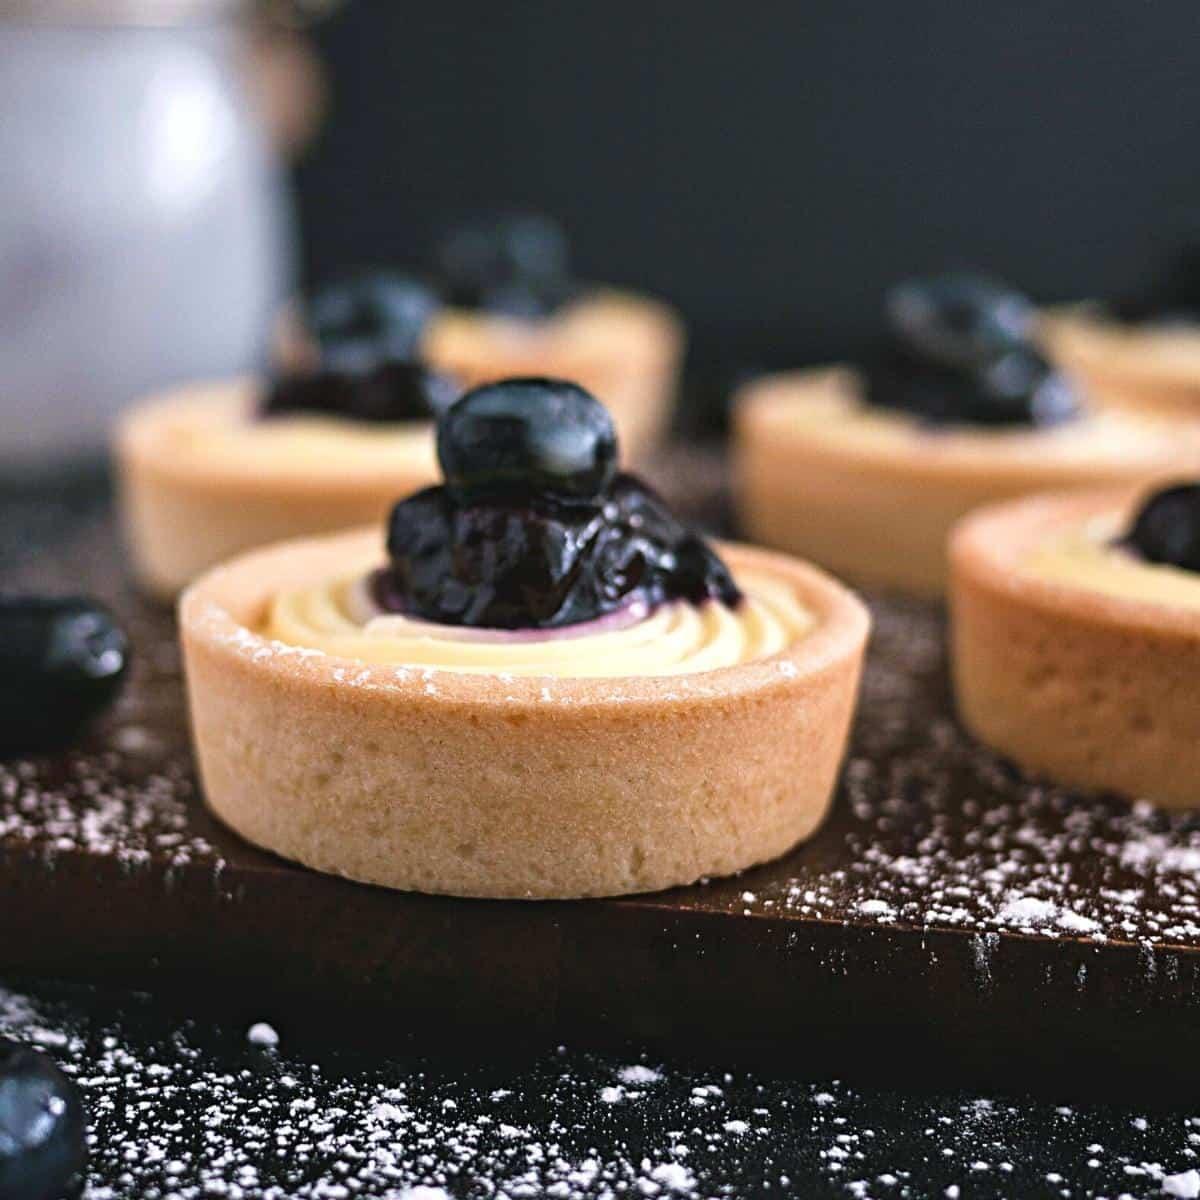 A few mini tarts o a wooden board.